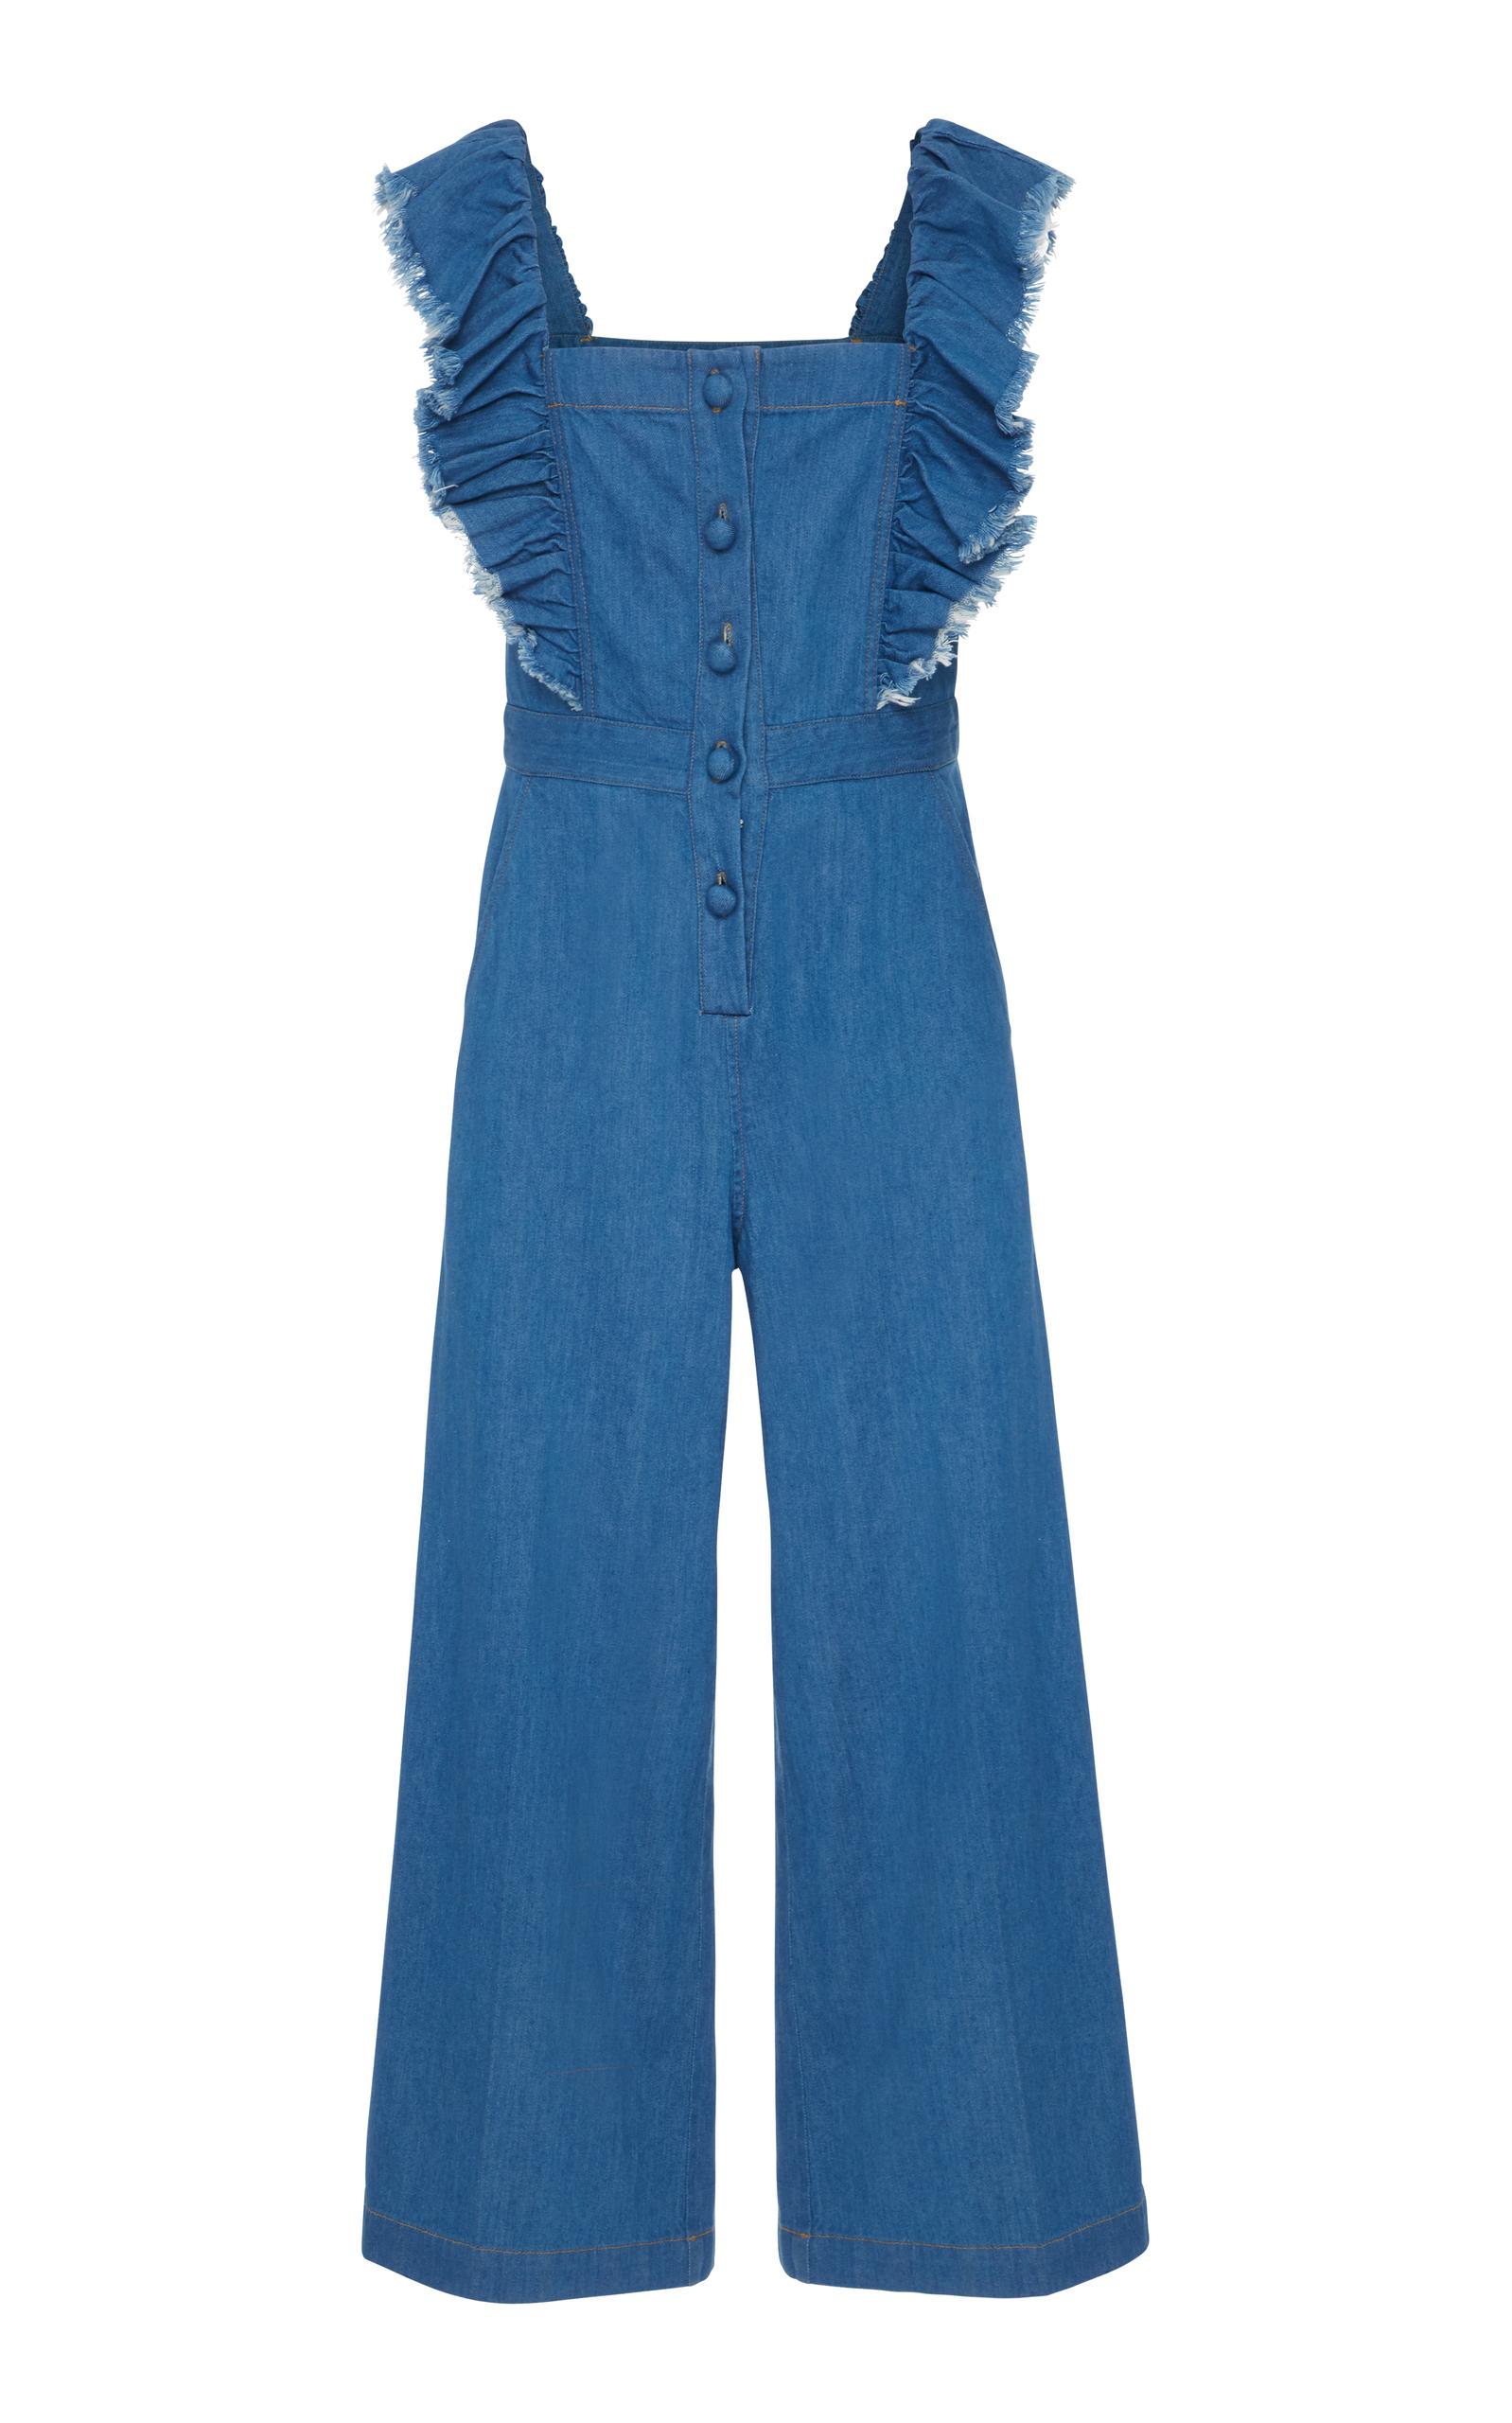 4a4bd96c5f2 Sea Wide-Leg Ruffled Denim Jumpsuit In Blue